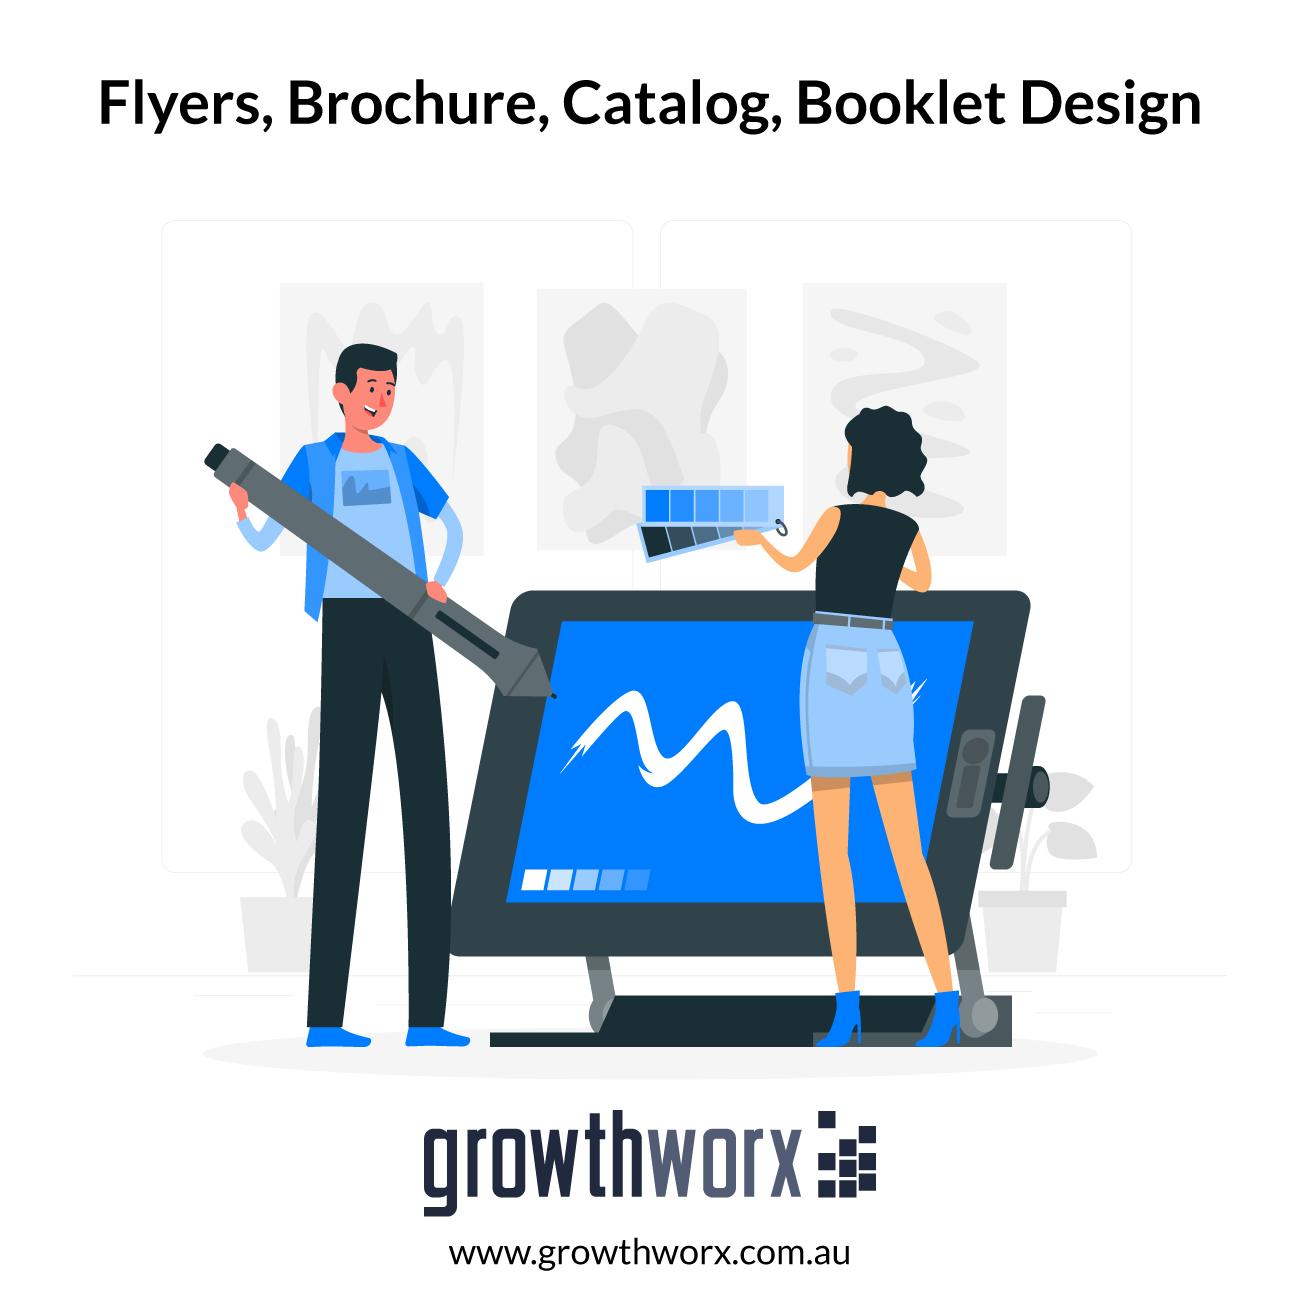 We will design flyers, brochure, catalog, booklet design 1